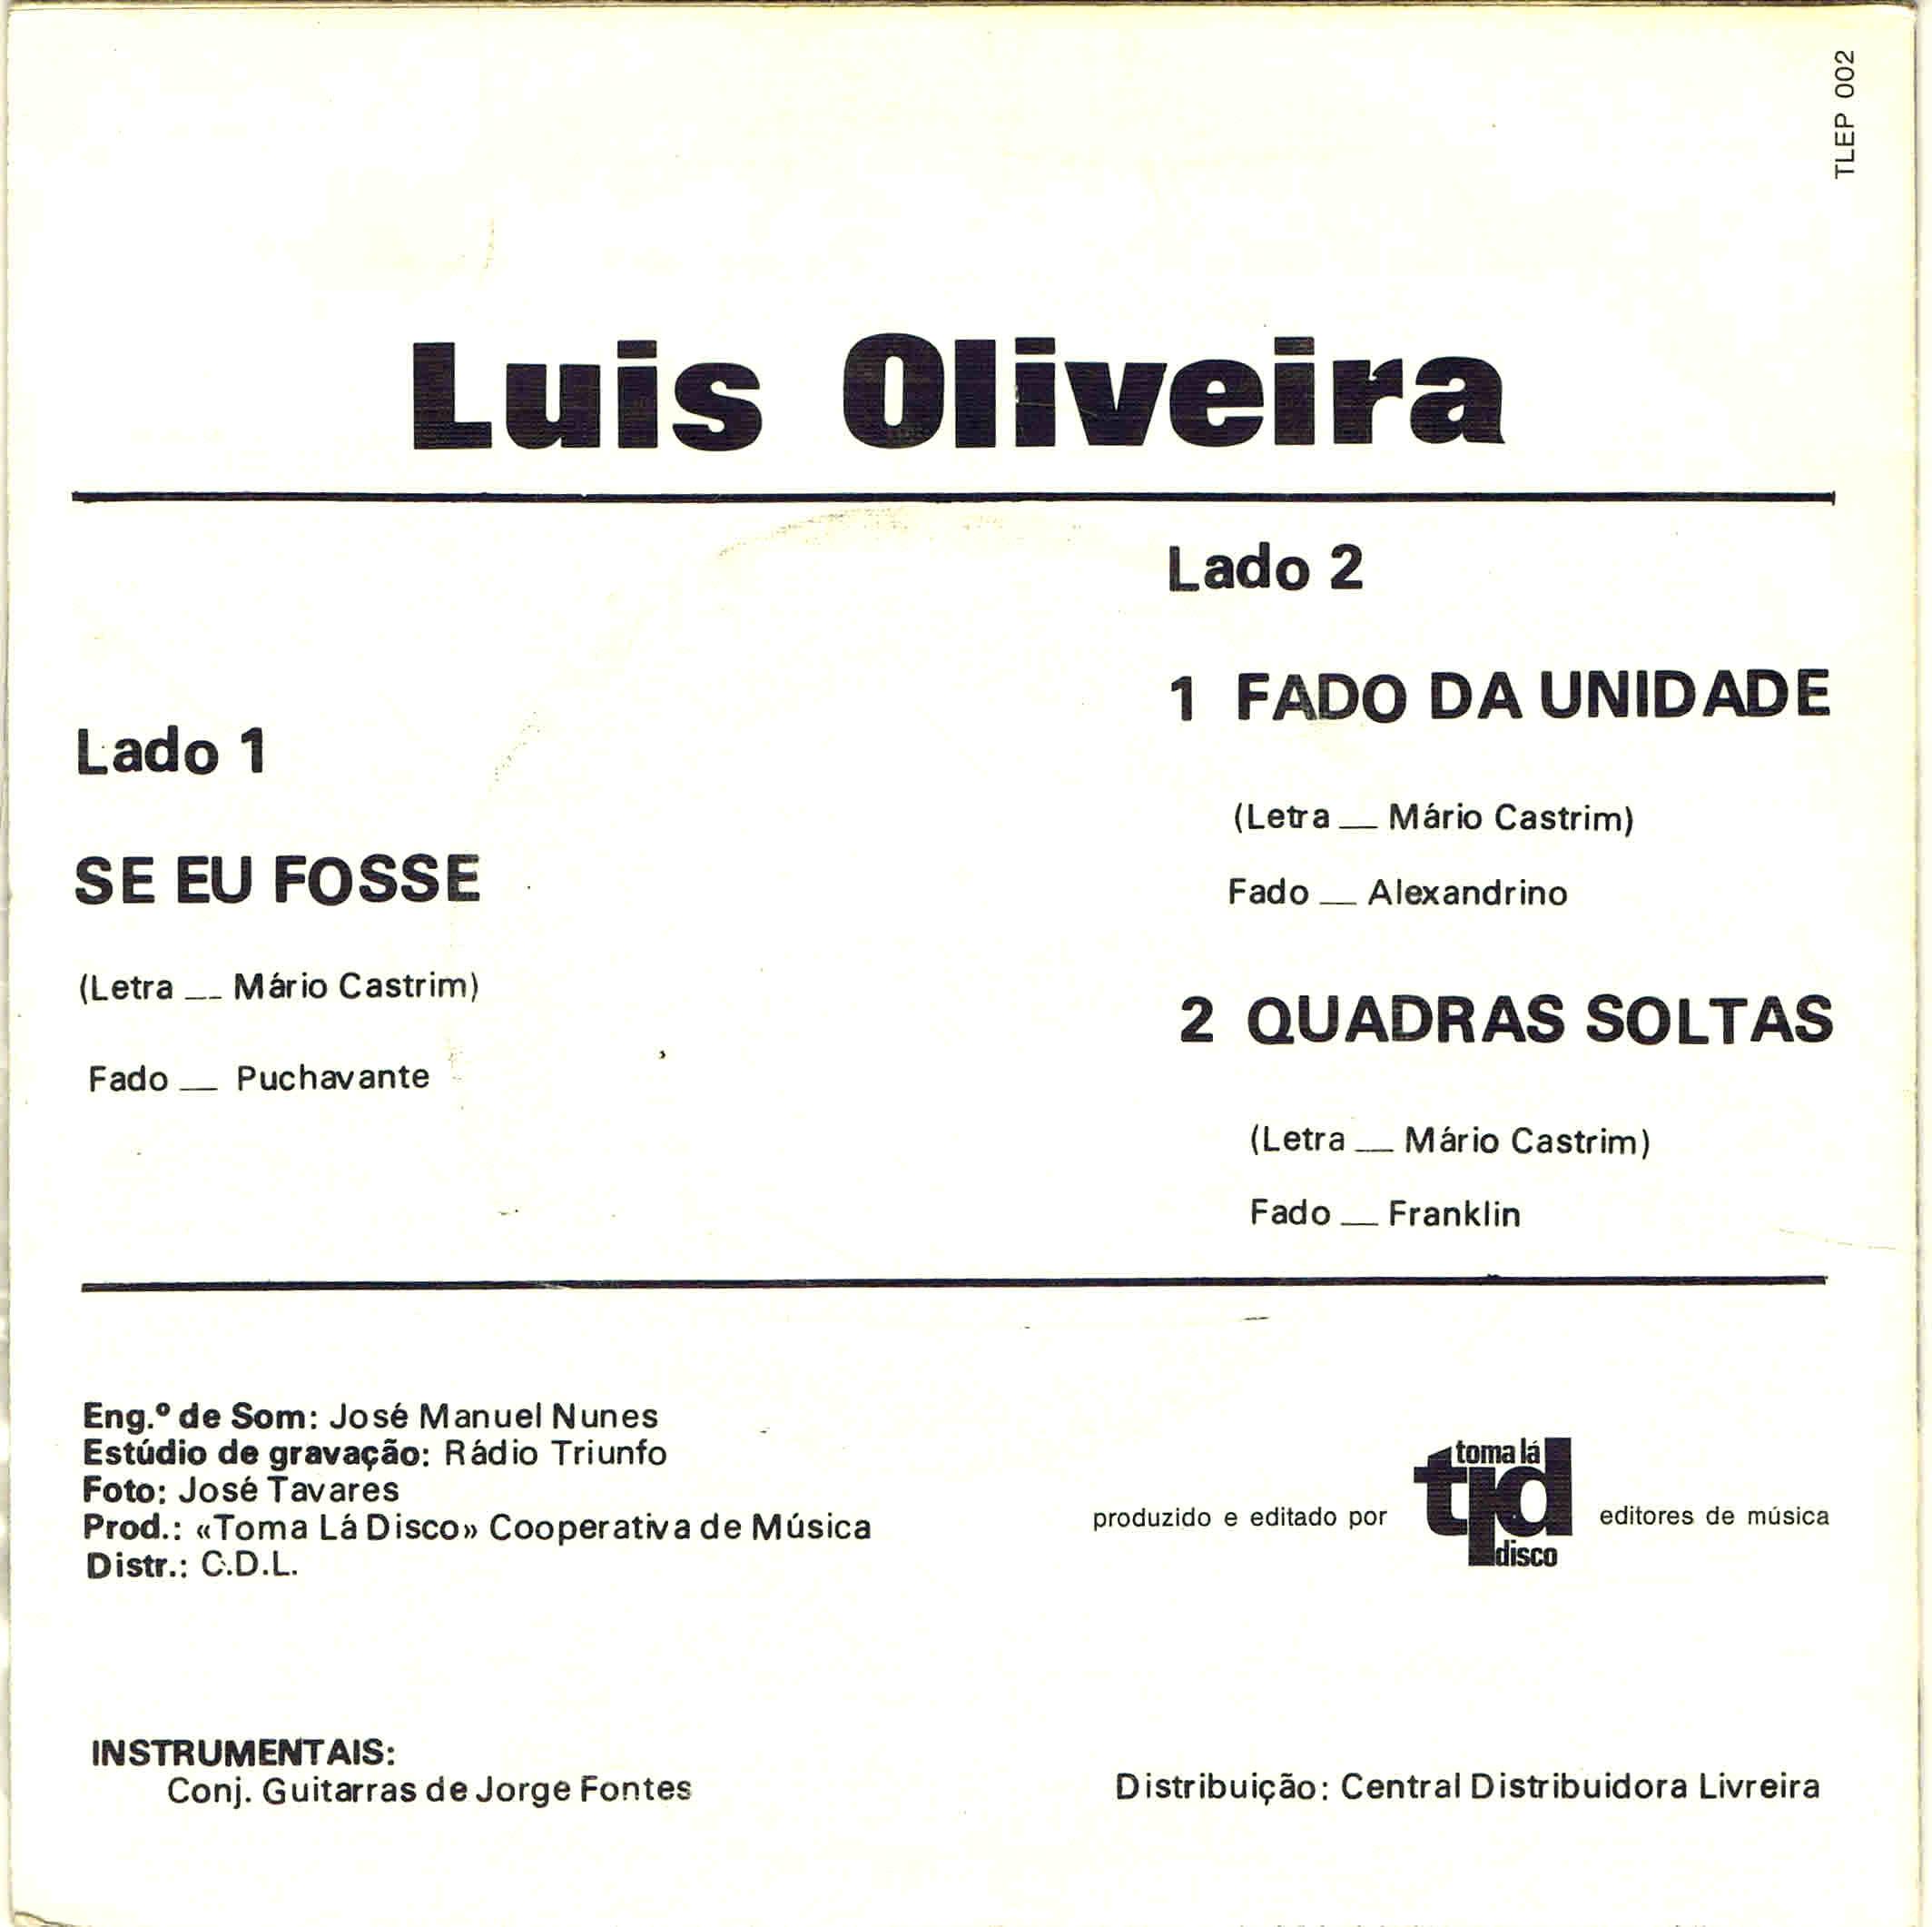 luis oliveira o fadista do dl vs